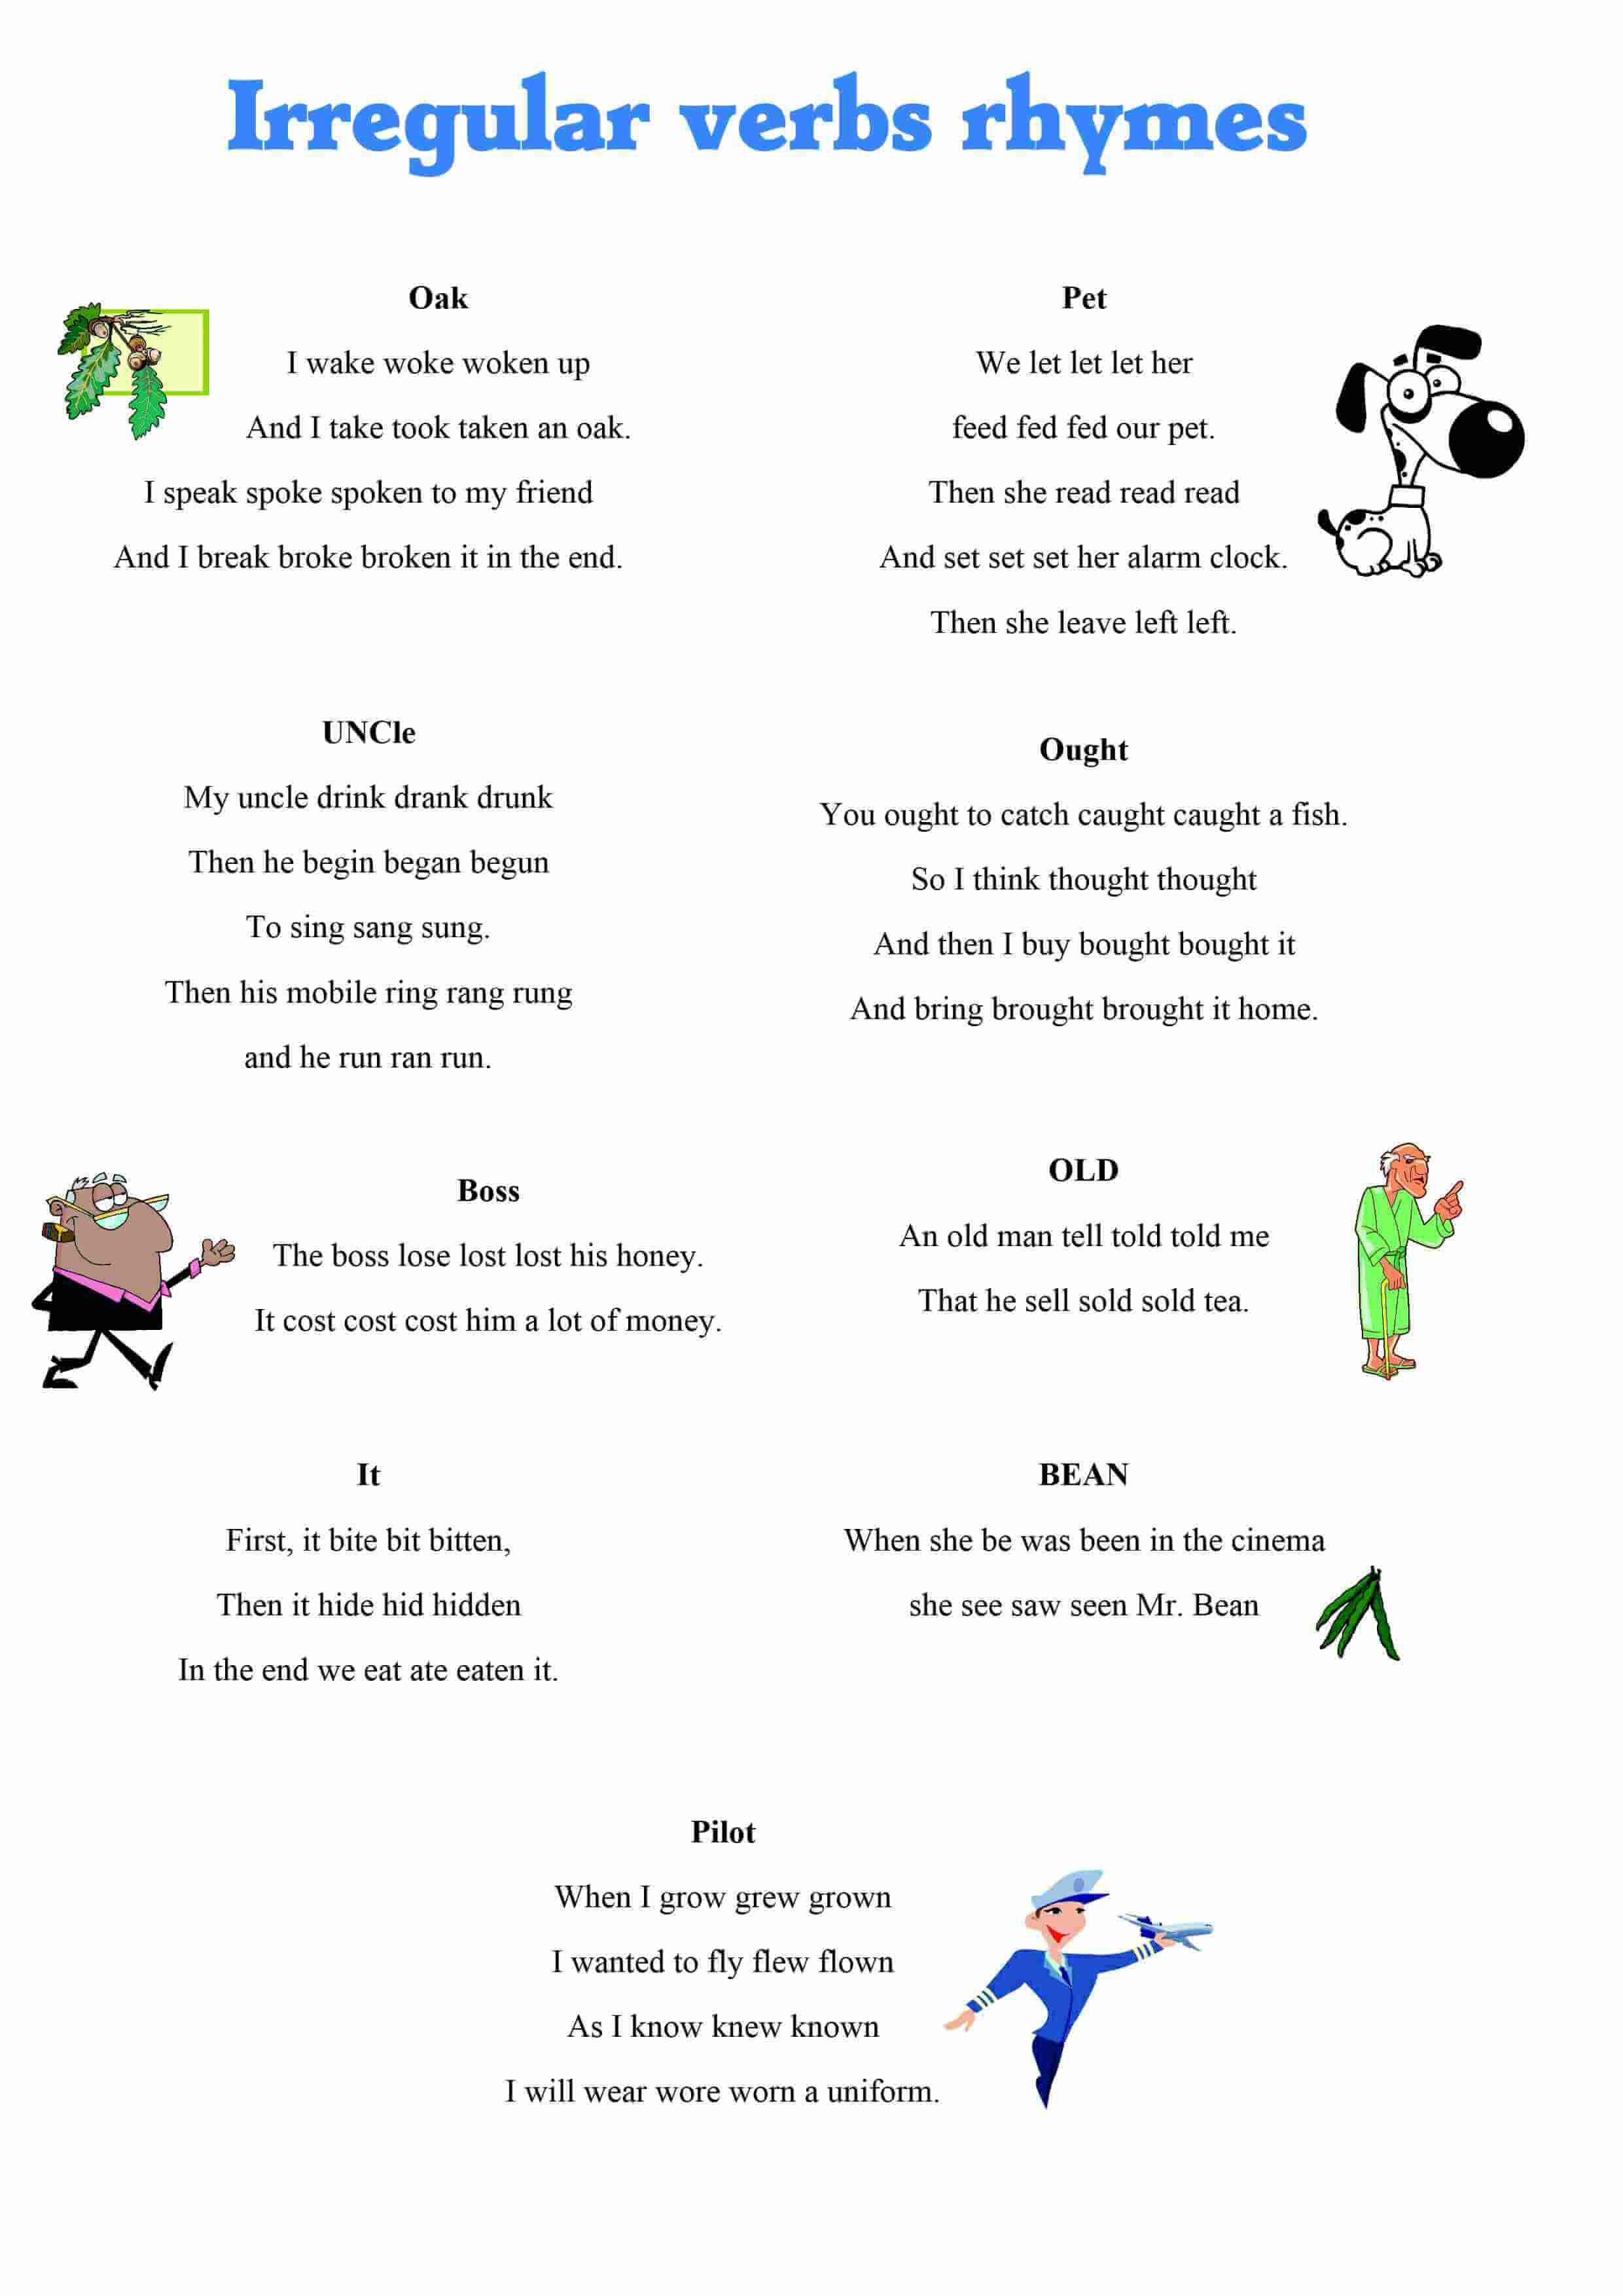 Irregular Verbs Rhymes